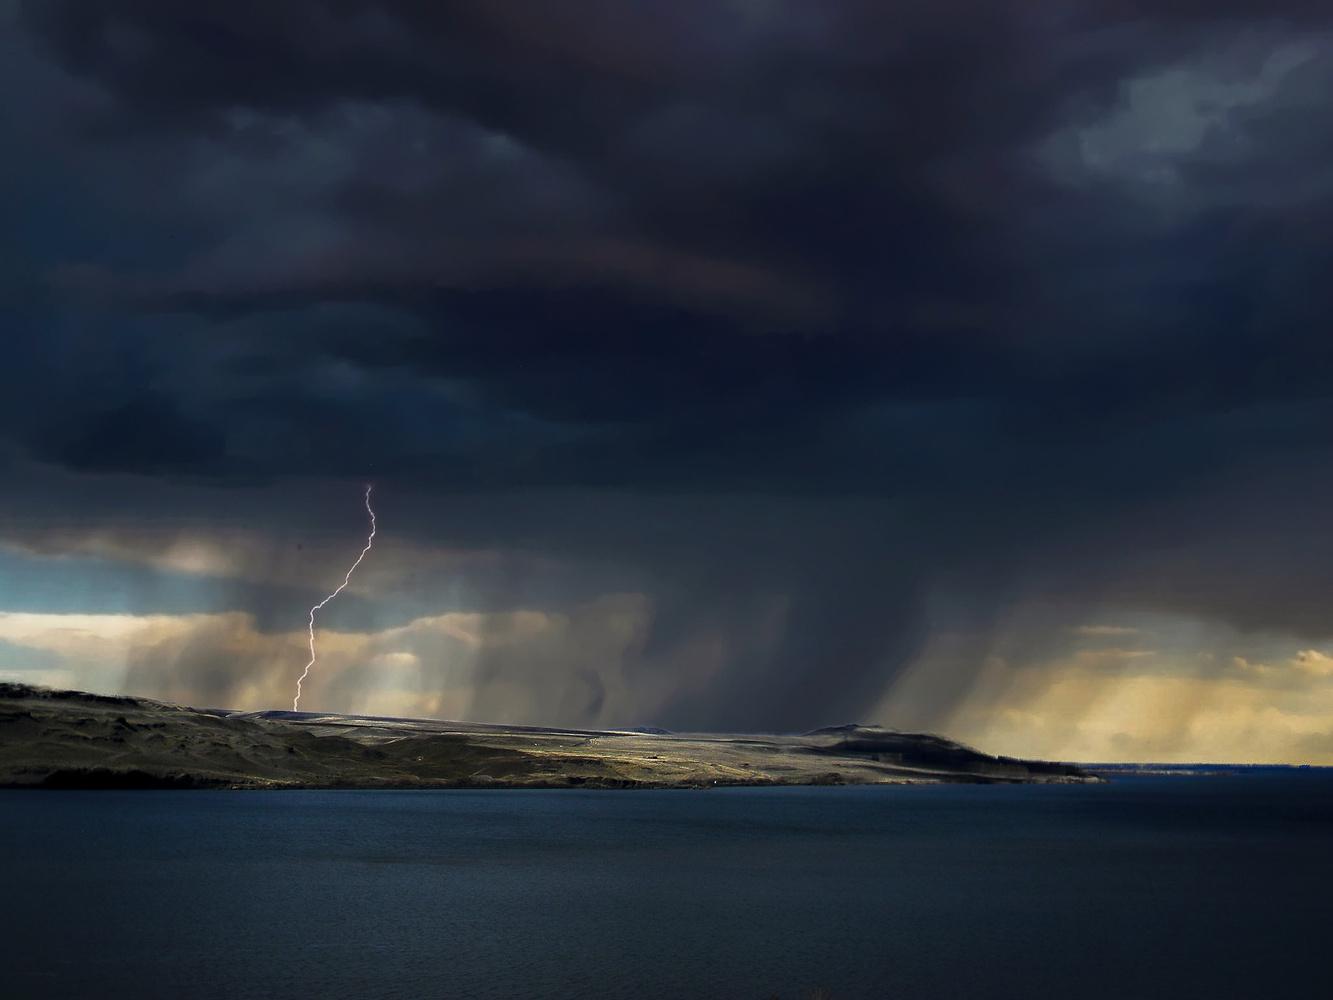 Spring storm #2 by Chris Snyder